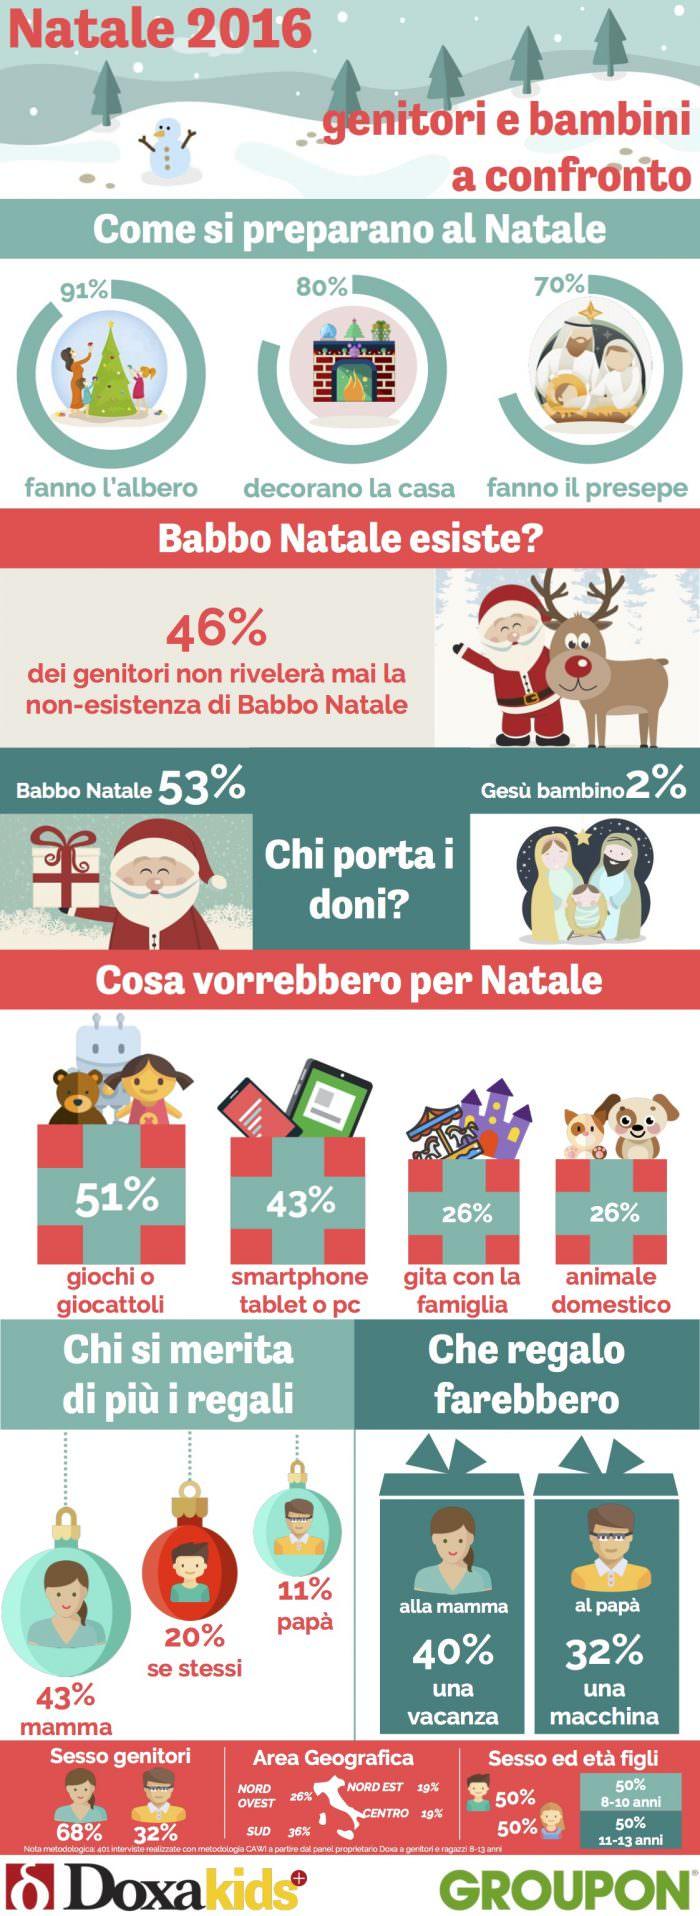 doxa-natale-2016-groupon-infografica